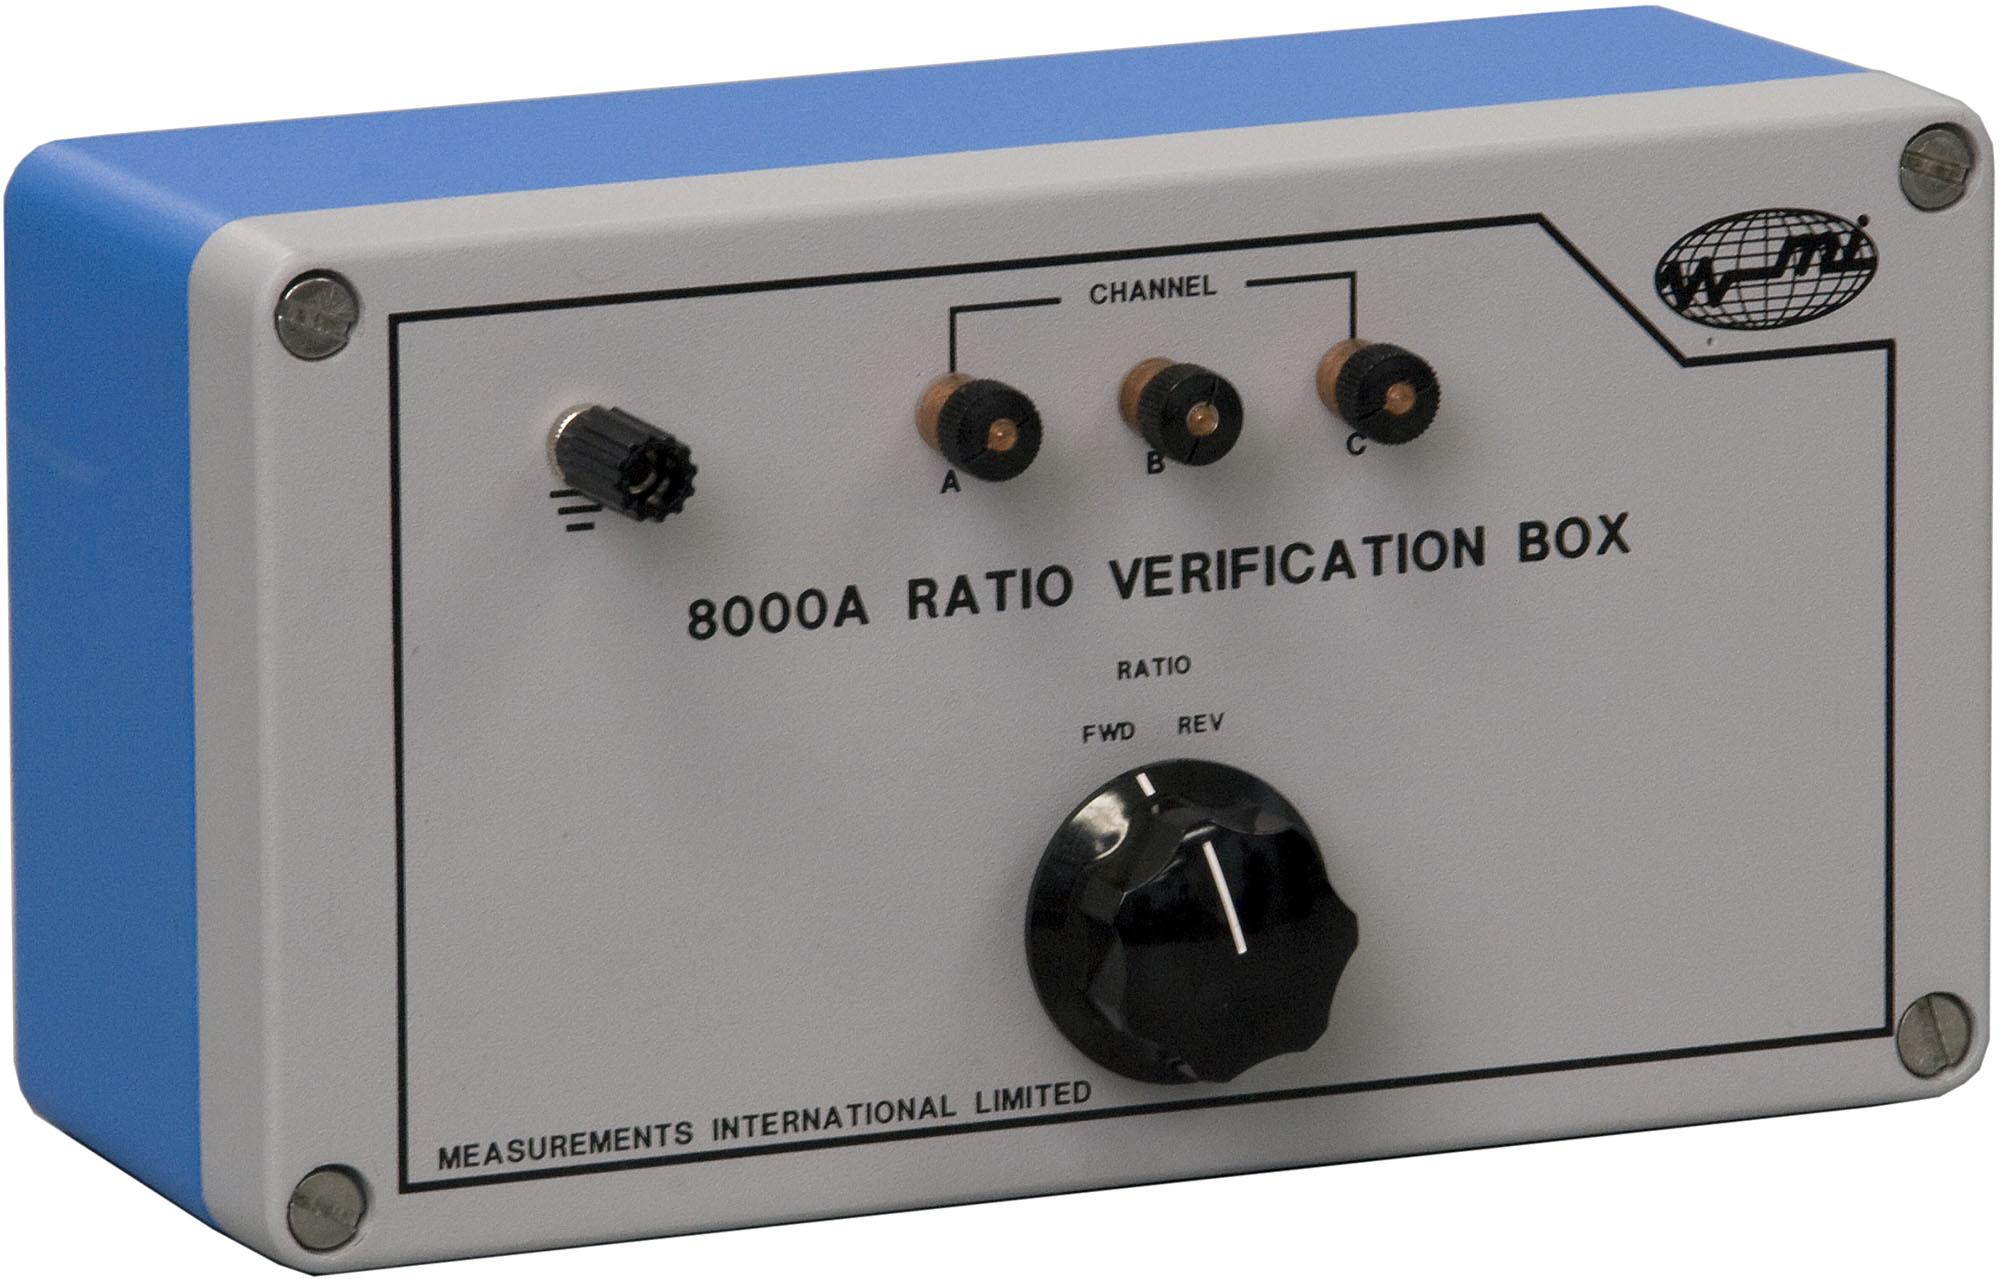 8000A Radio Verification Box